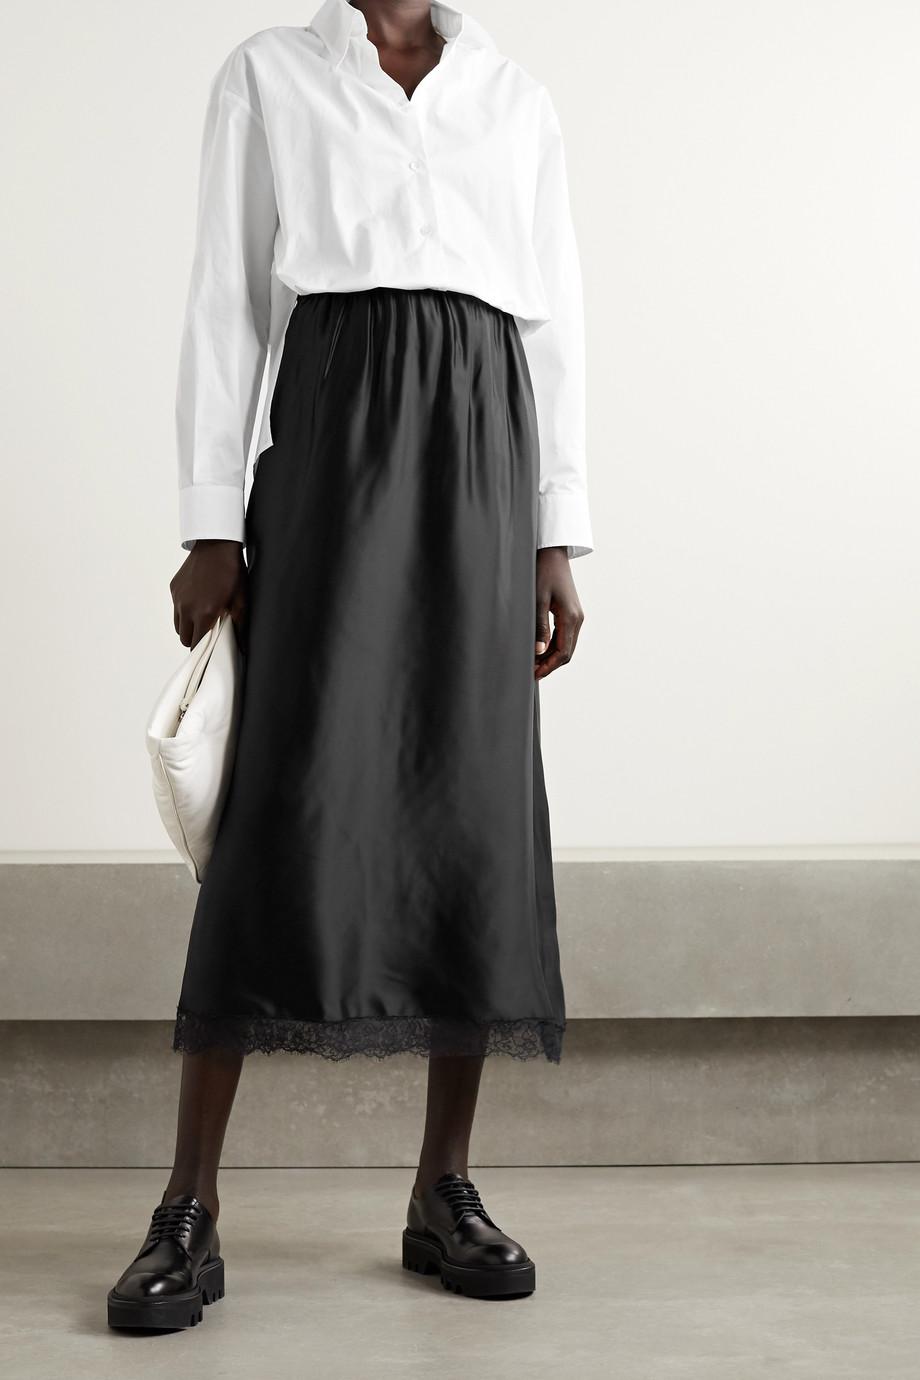 MM6 Maison Margiela Two-tone lace-trimmed satin and cotton-poplin midi shirt dress